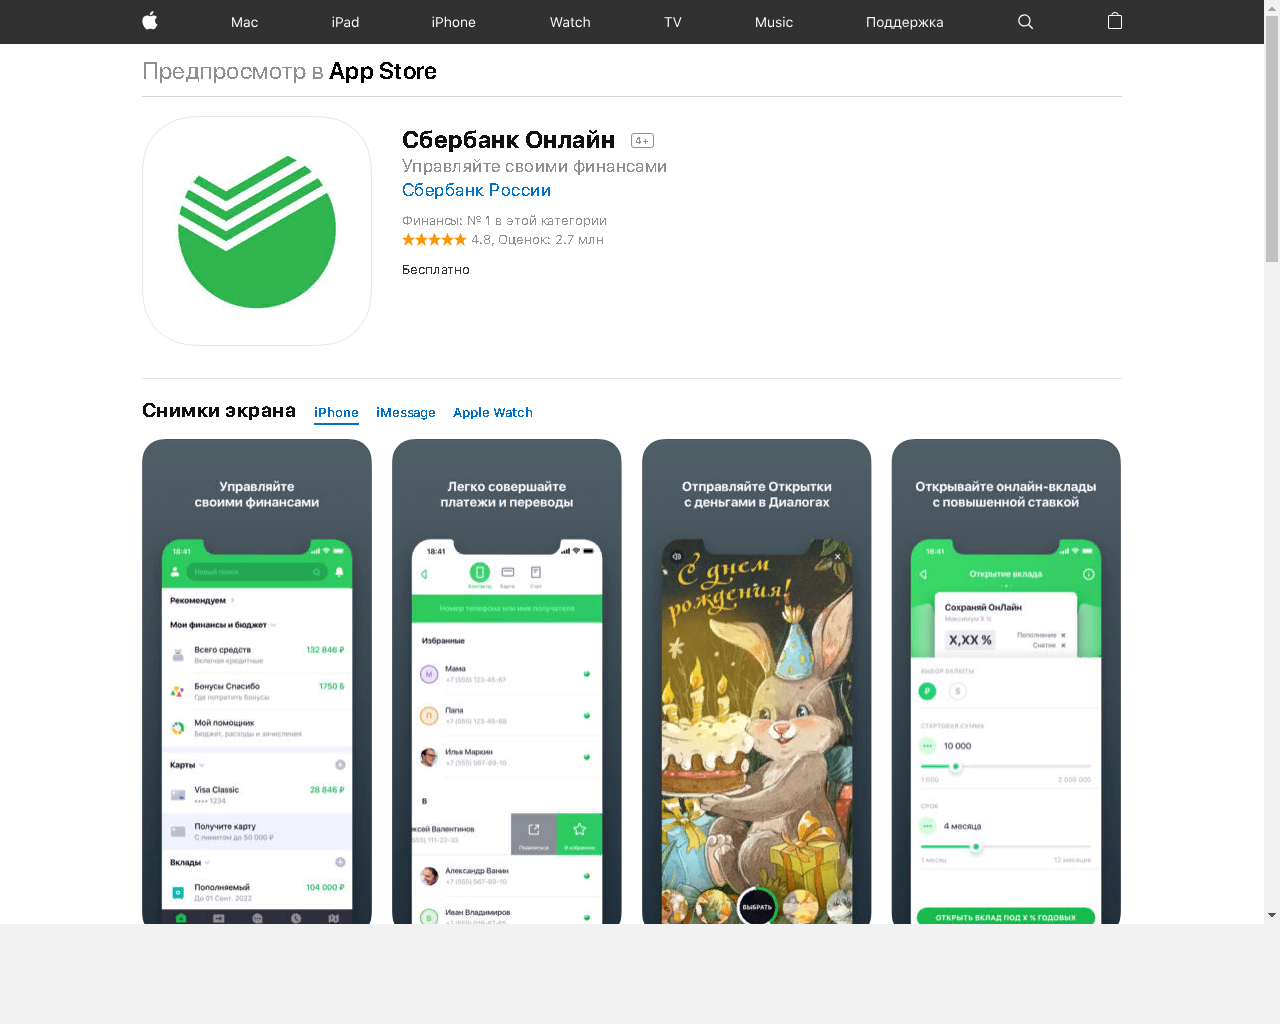 App Store Сбербанк